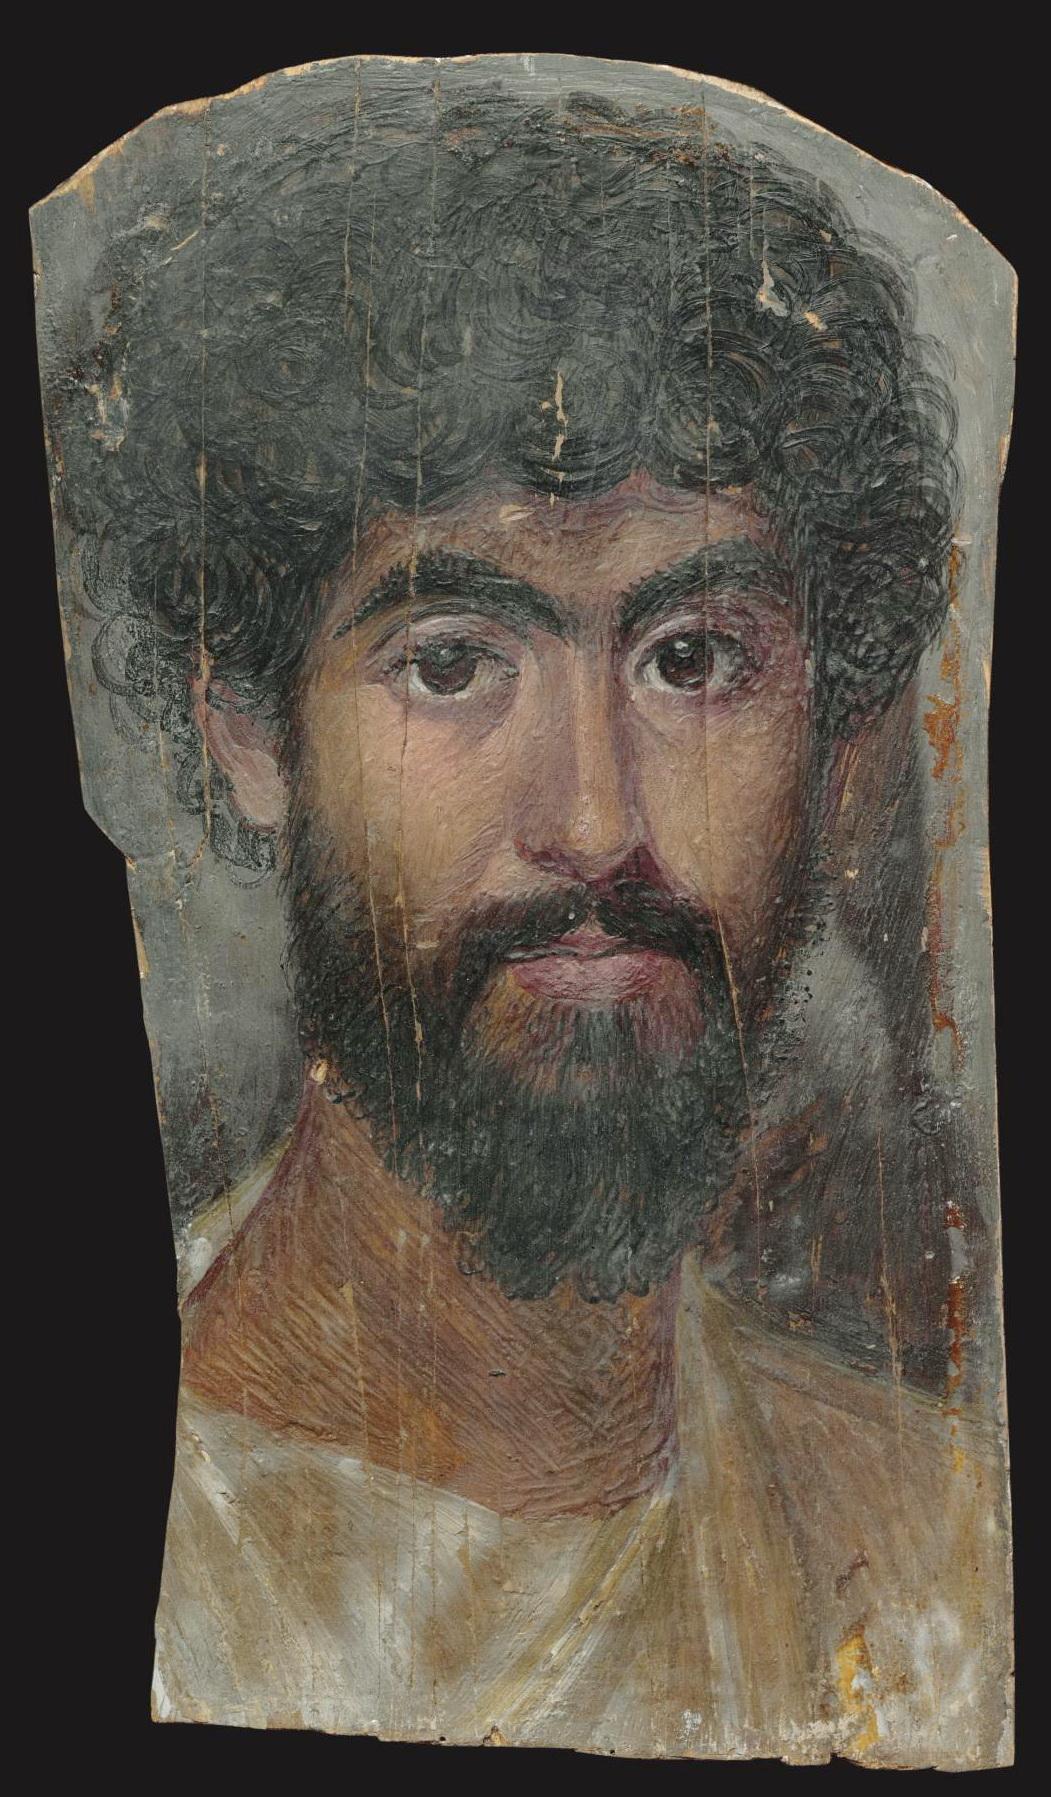 https://upload.wikimedia.org/wikipedia/commons/e/e5/Fayum_mummy_portrait_%28Sotheby%27s%29.jpg